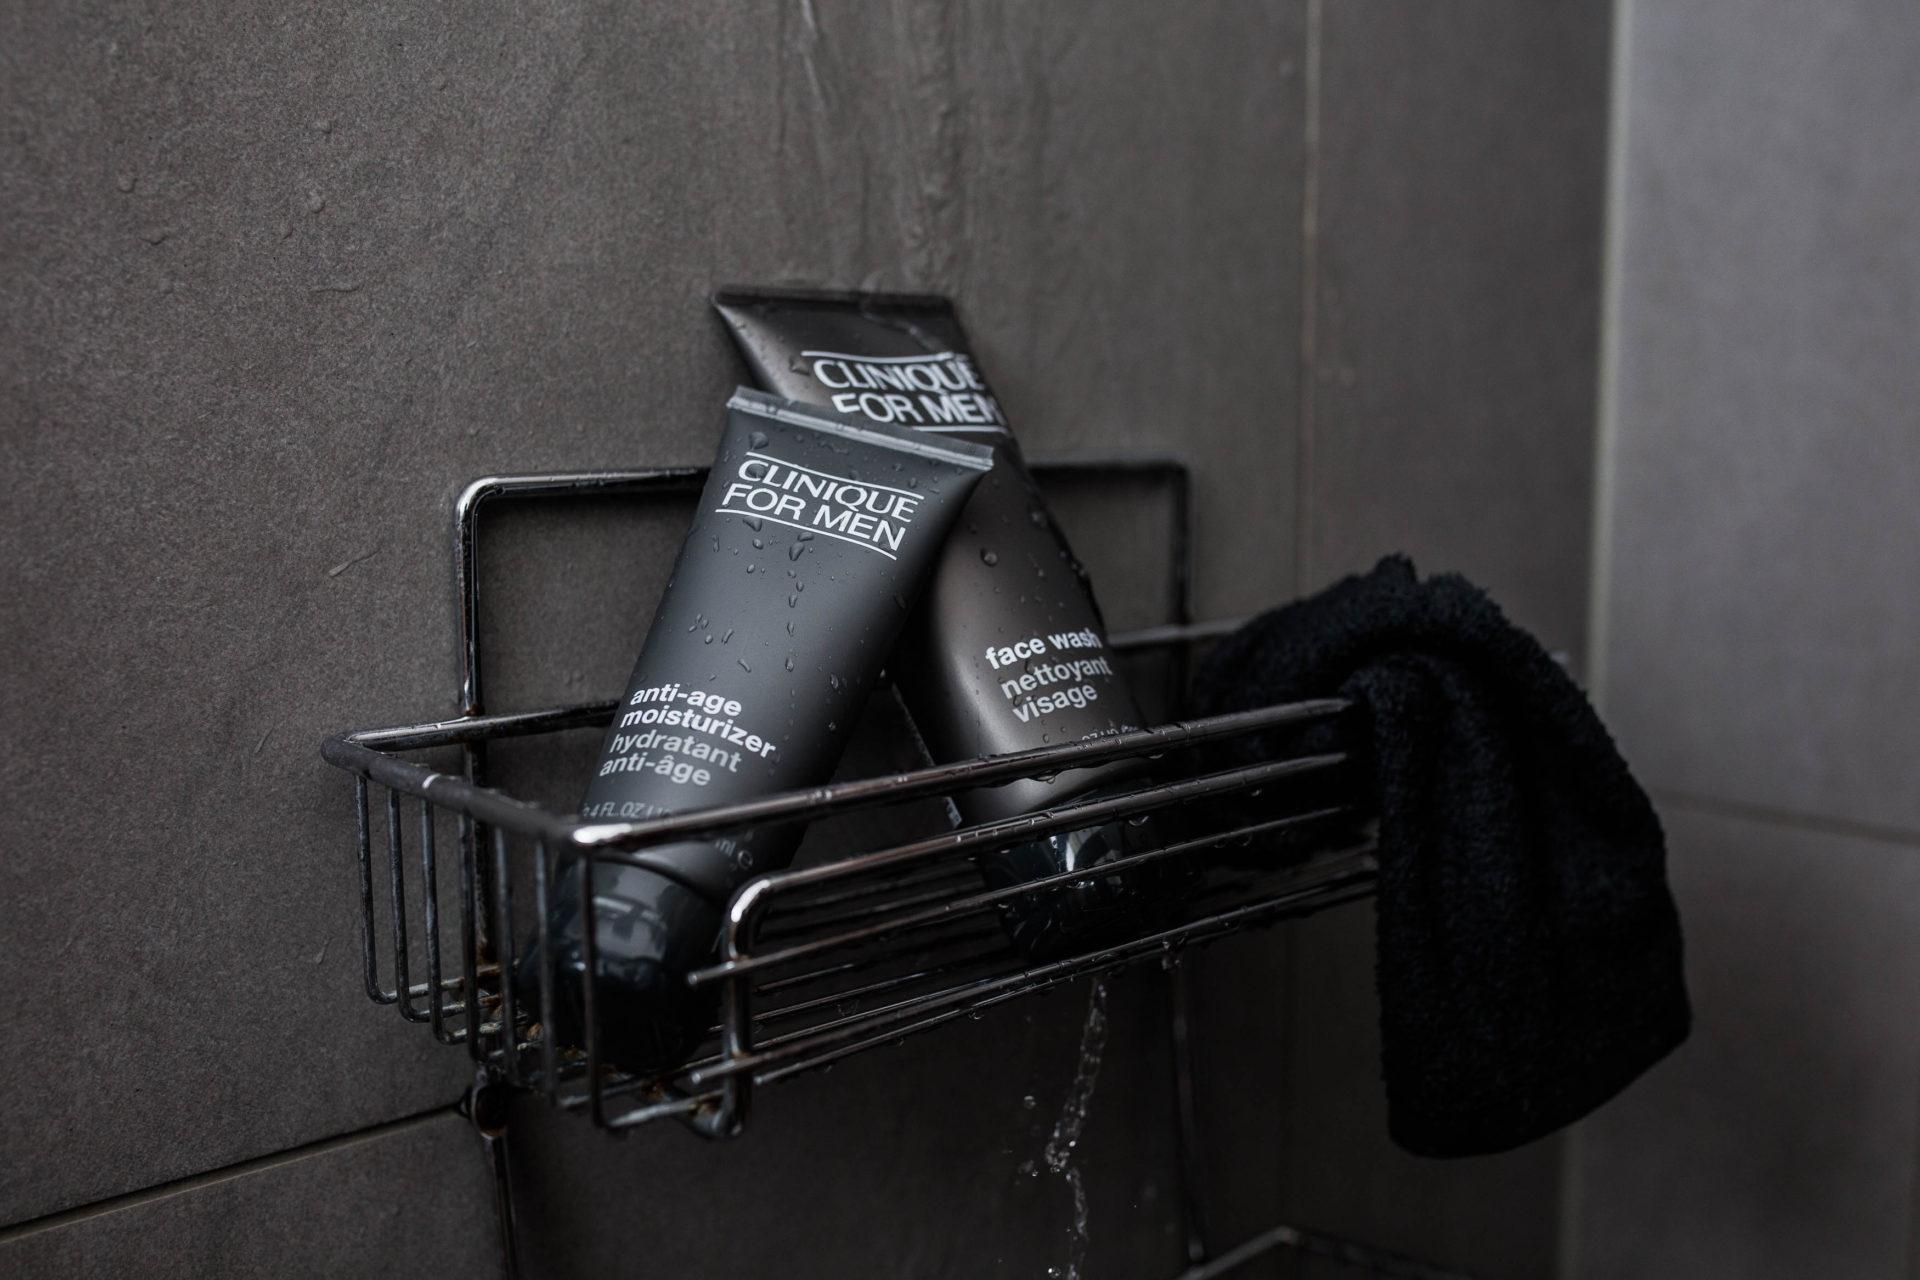 Clinique For Men Face Wash and Moisturizer